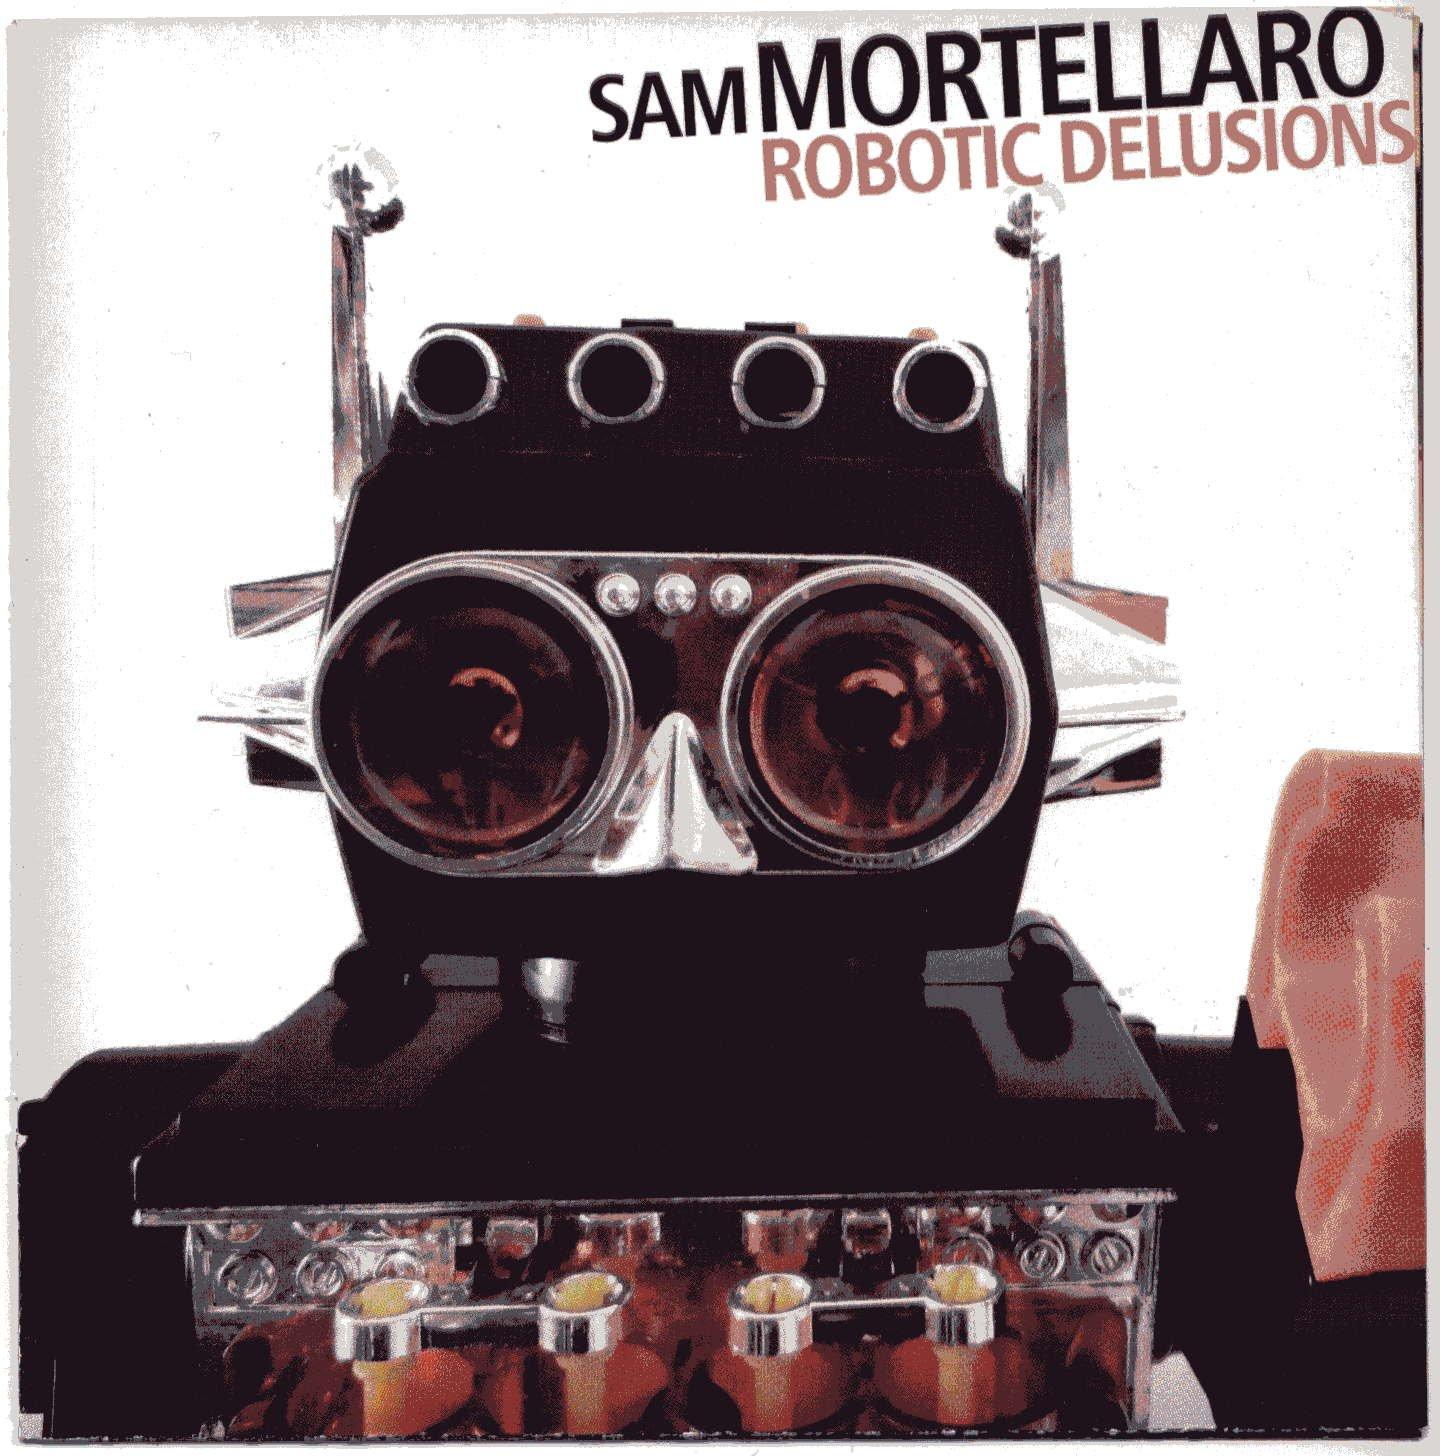 Sam Mortellaro</br>Robotic Delusions</br>Auand, 2016